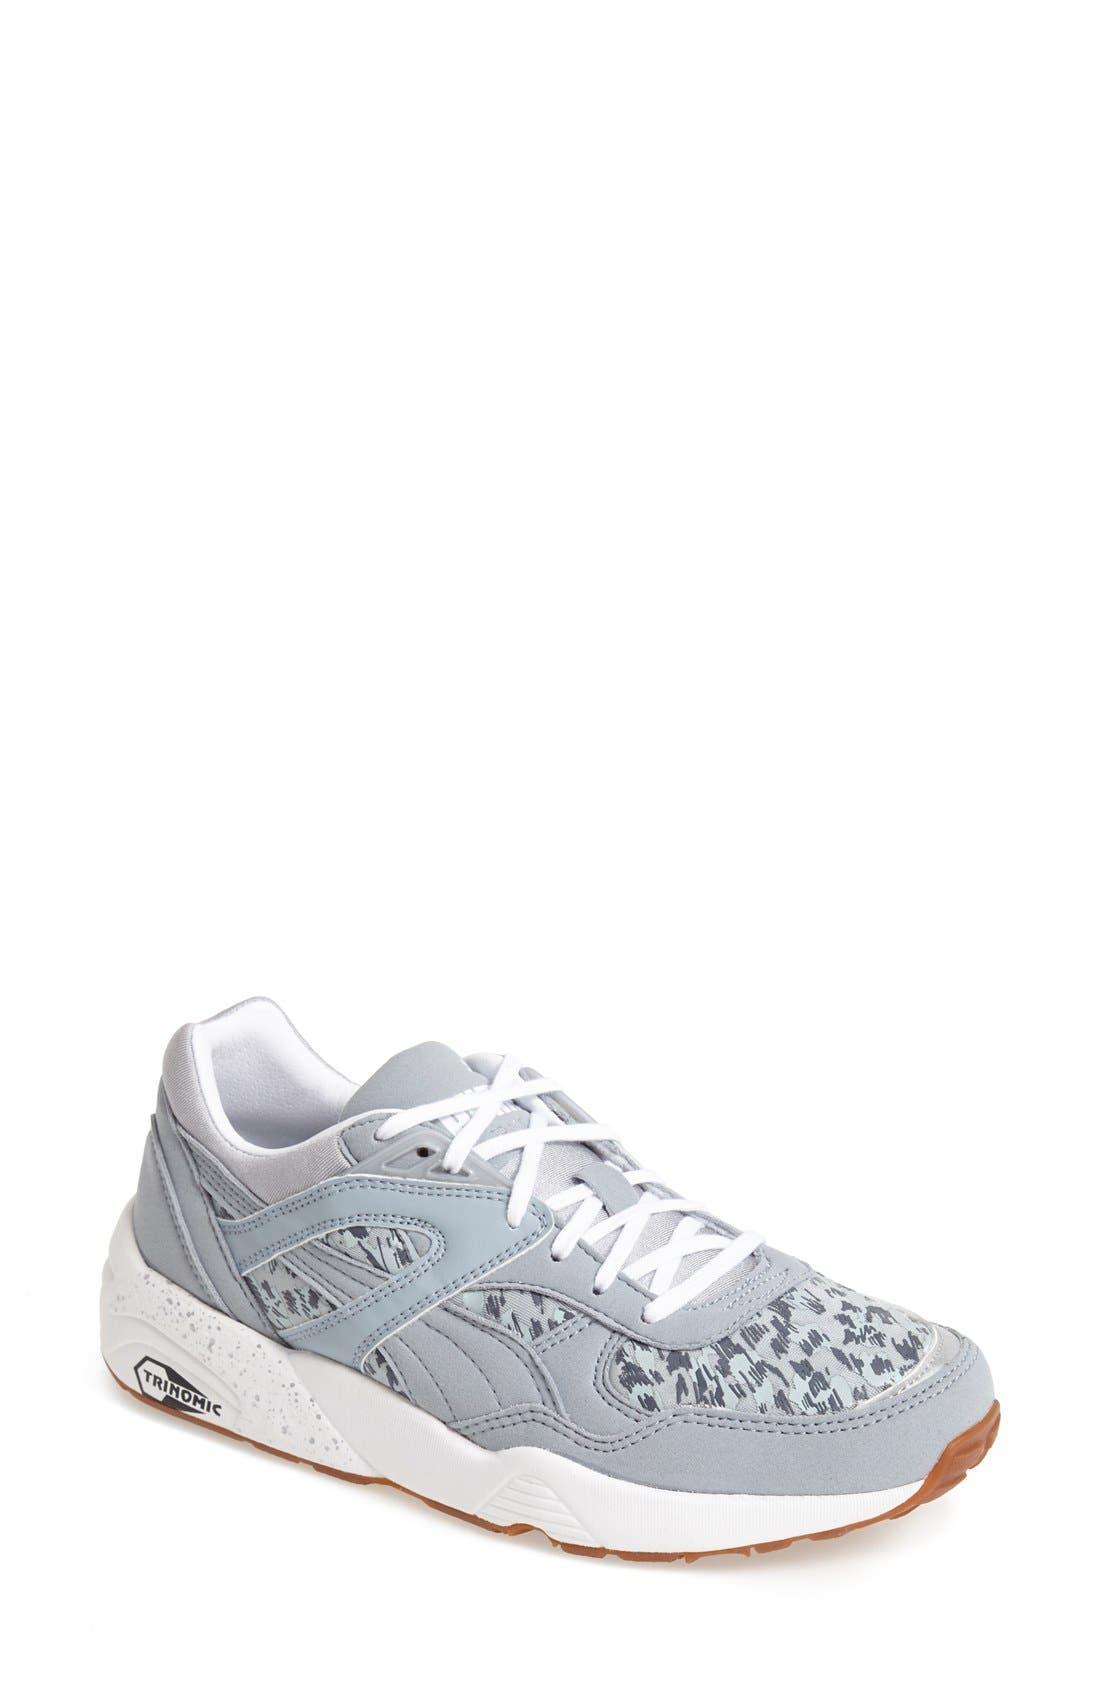 Alternate Image 1 Selected - PUMA 'Trinomic R698' Sneaker (Women)